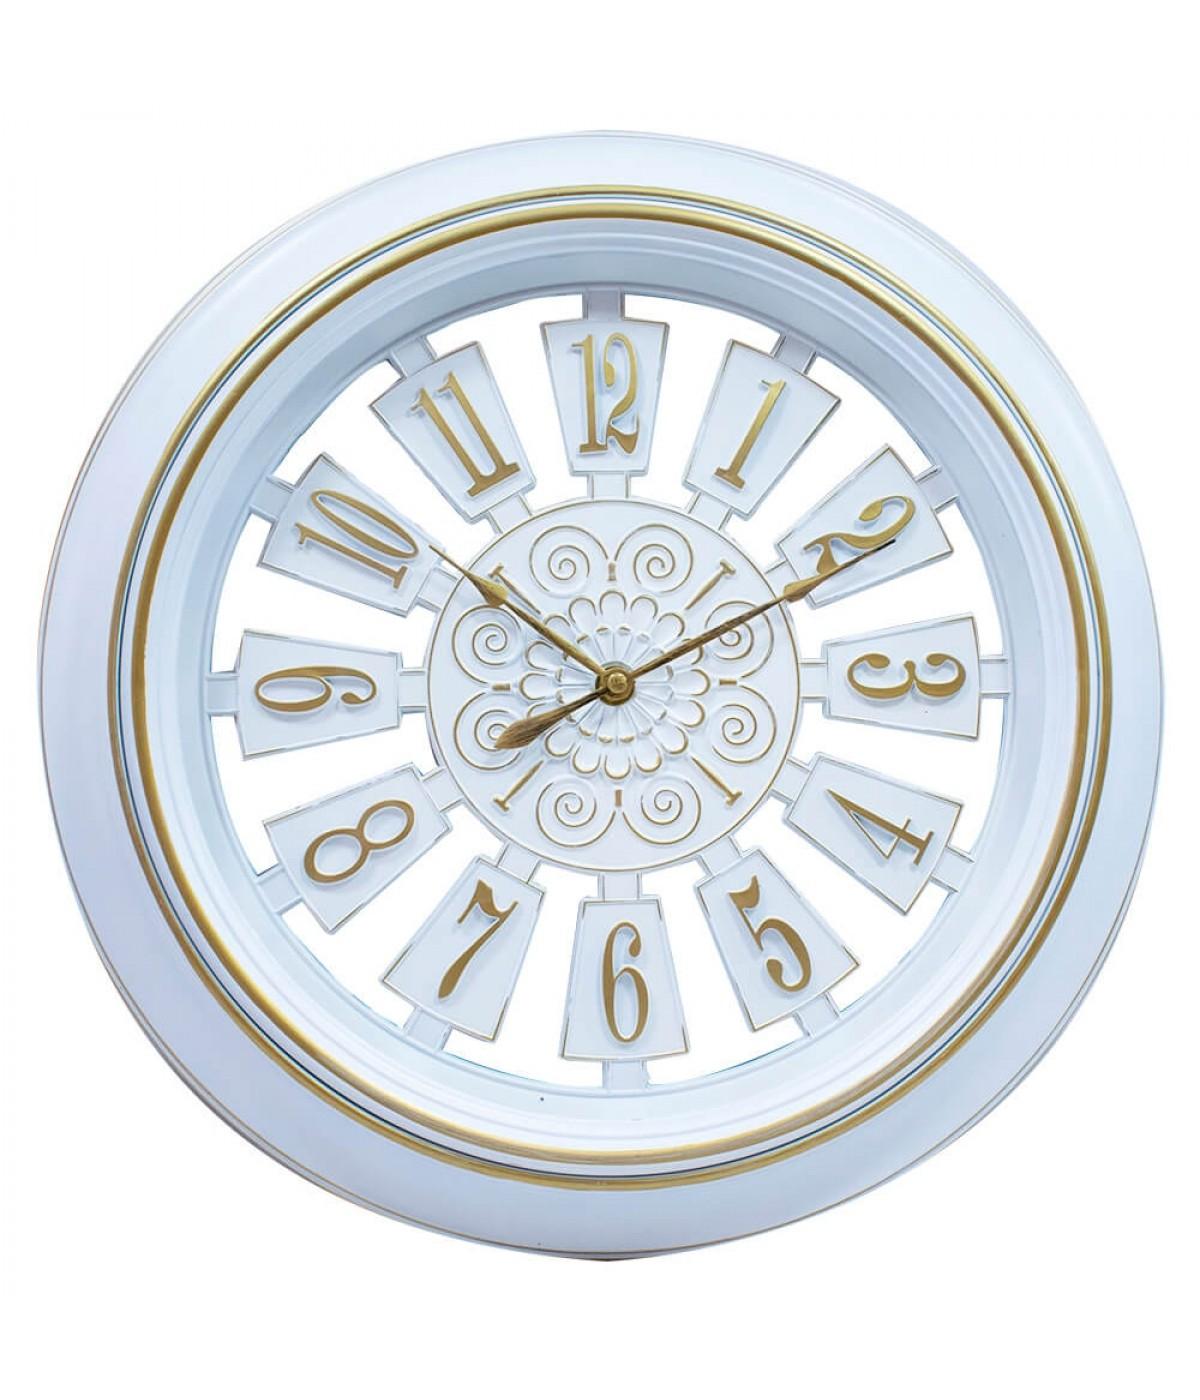 Relógio Parede Branco 40x40cm